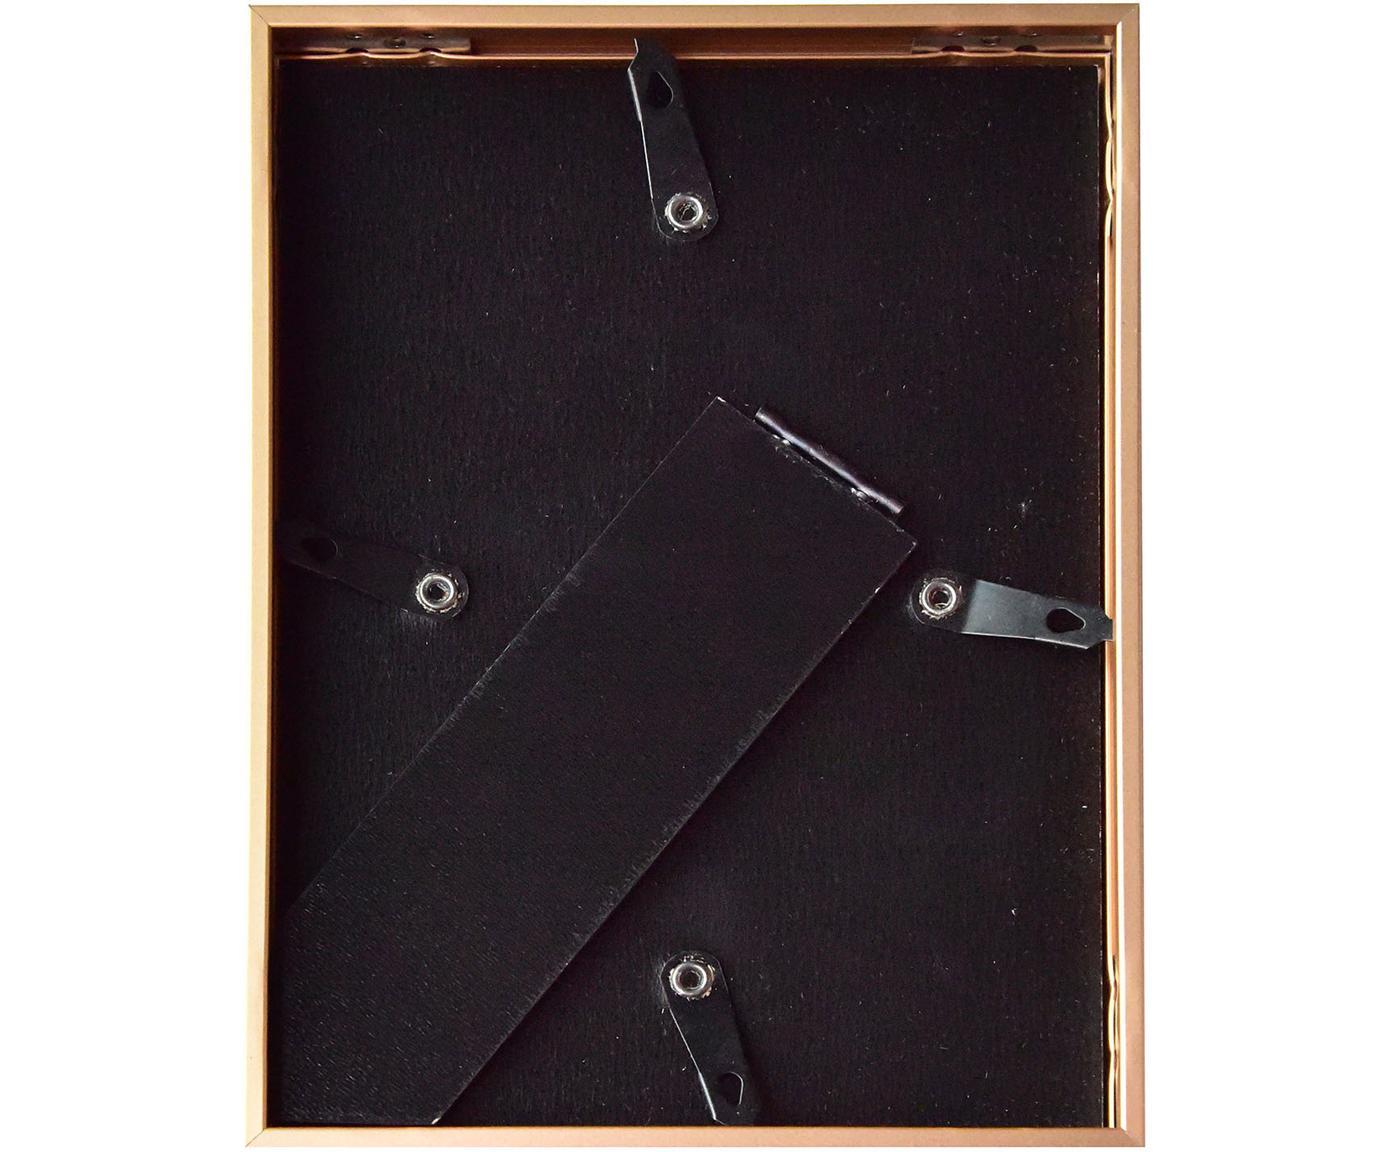 Bilderrahmen Duo, Rahmen: Aluminium, foliert, Front: Glas, Rückseite: Mitteldichte Holzfaserpla, Hellbraun, 10 x 15 cm